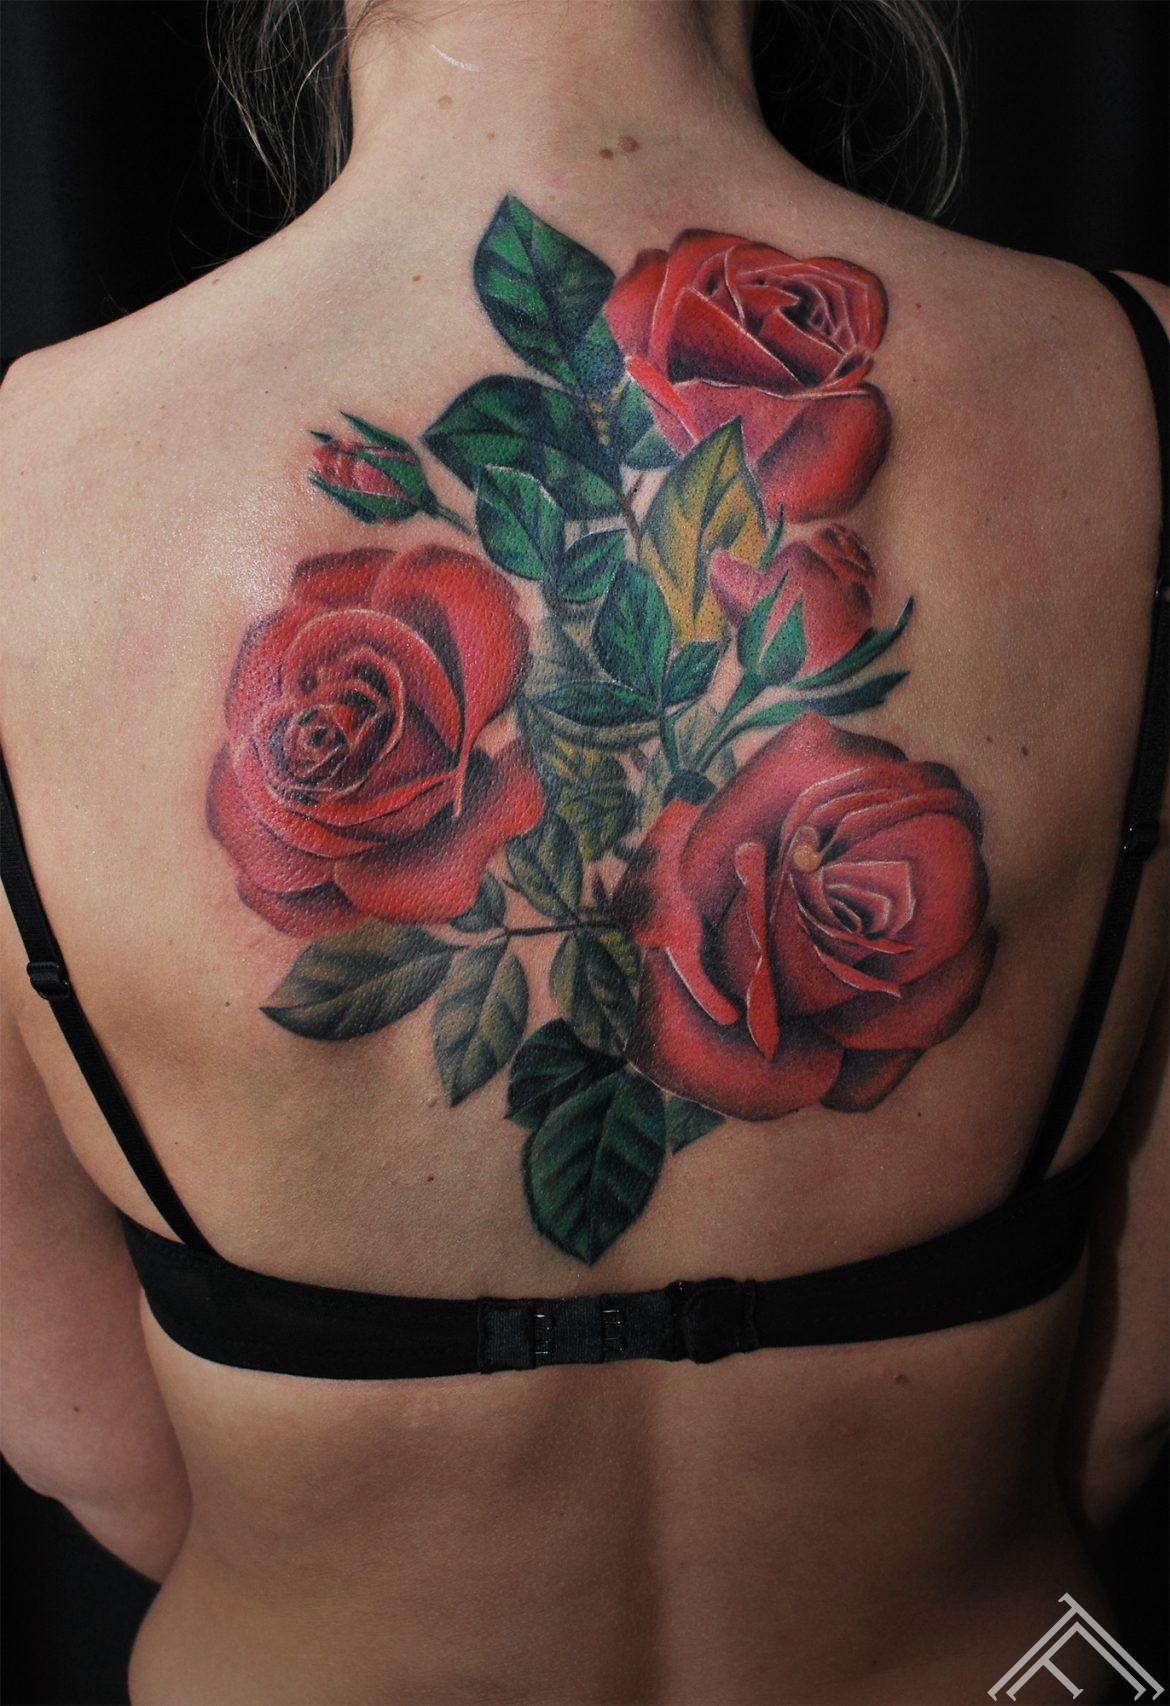 janisanderson-tattoo-tattoofrequency-riga-sporta2-art-roses-rozes-tetovejums